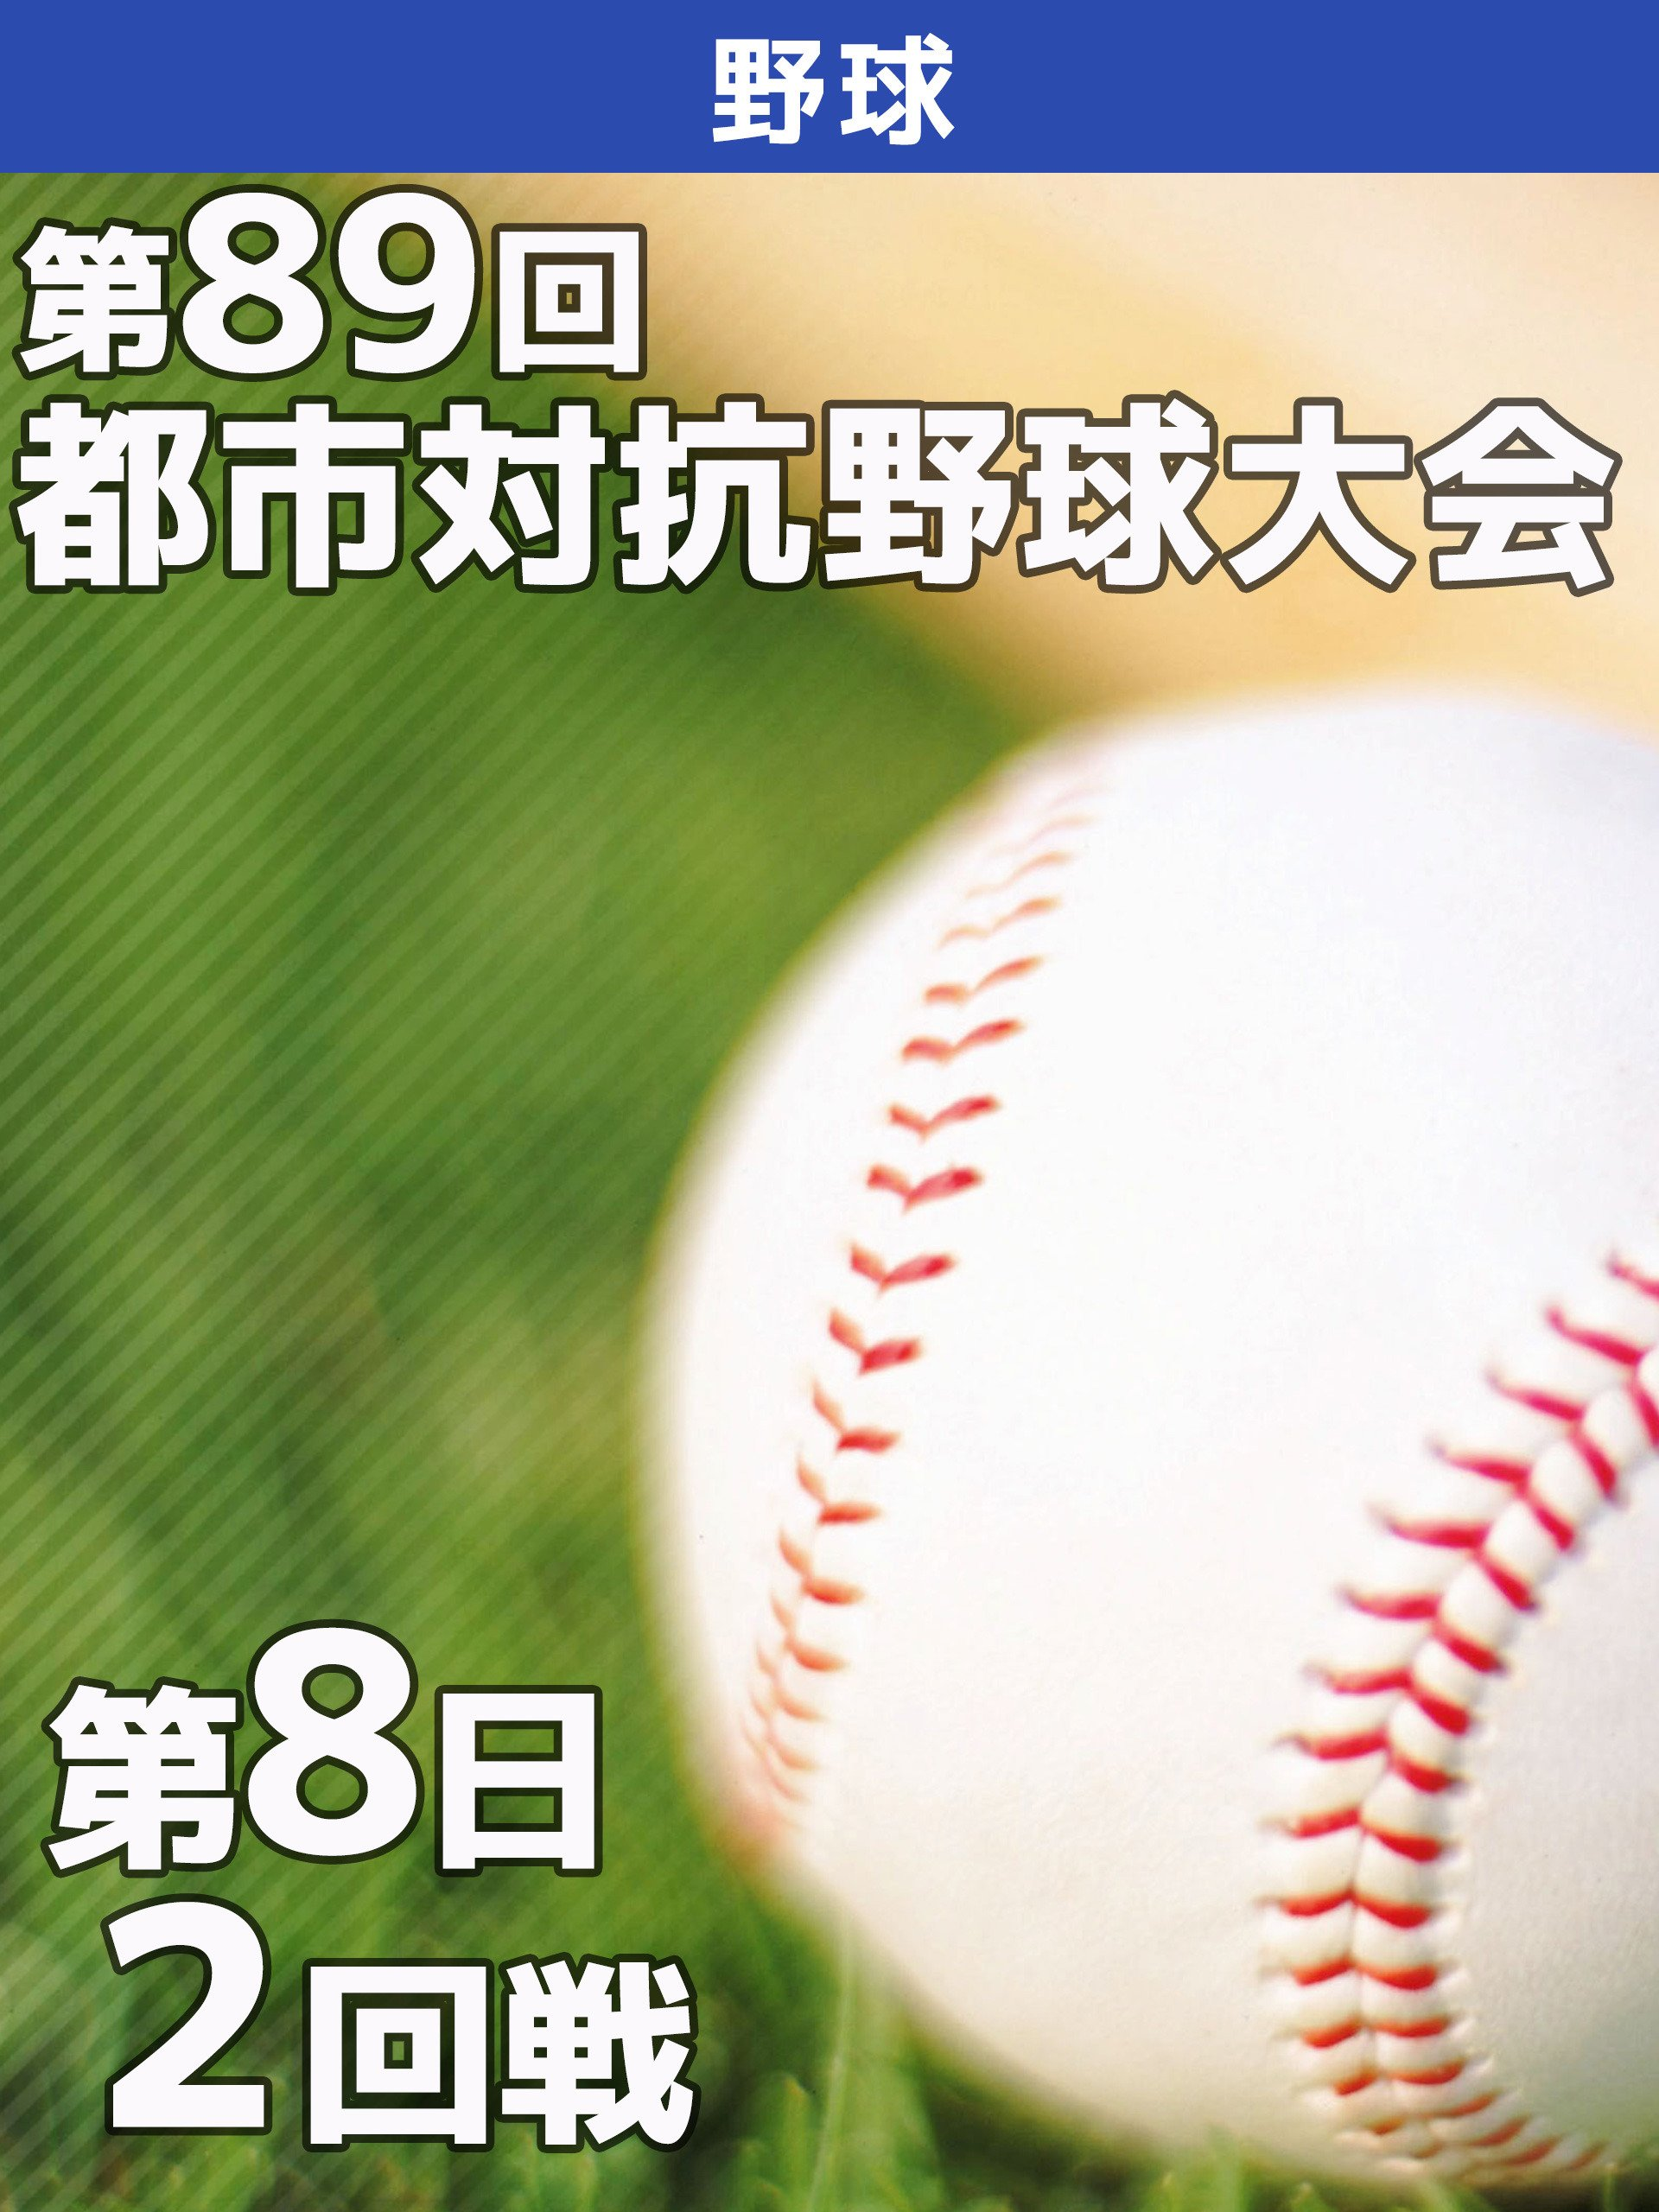 Amazon.co.jp: 第89回 都市対抗...